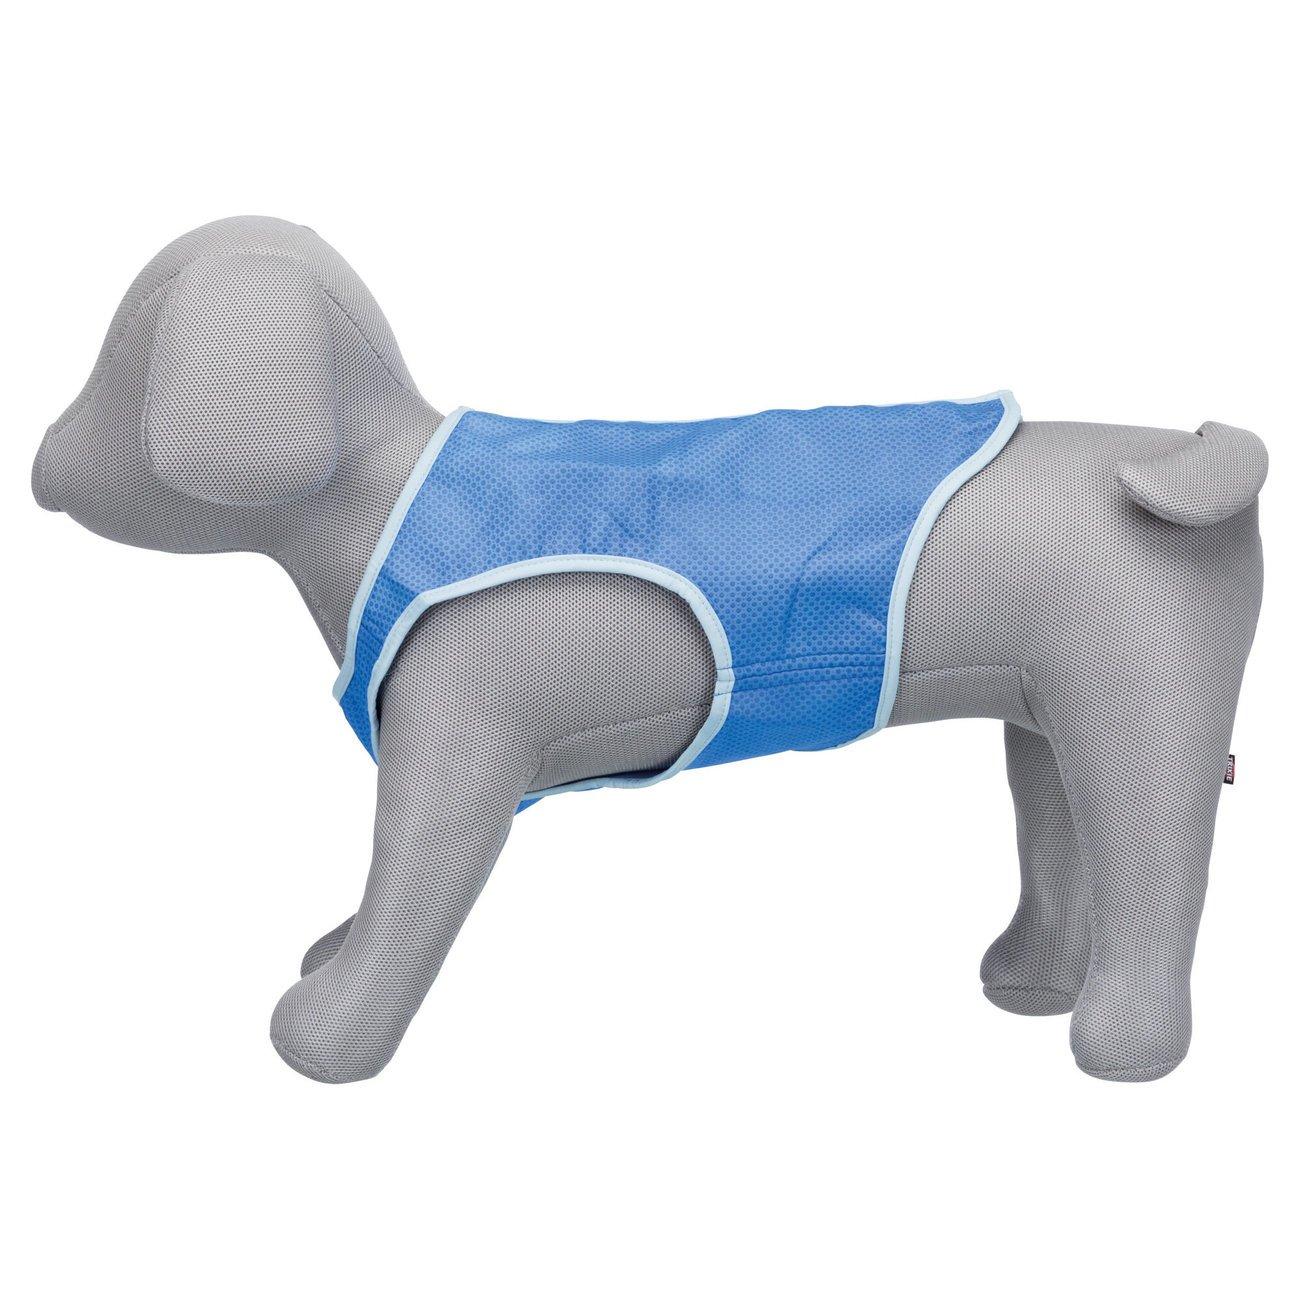 TRIXIE Kühlweste für Hunde 30131, Bild 5